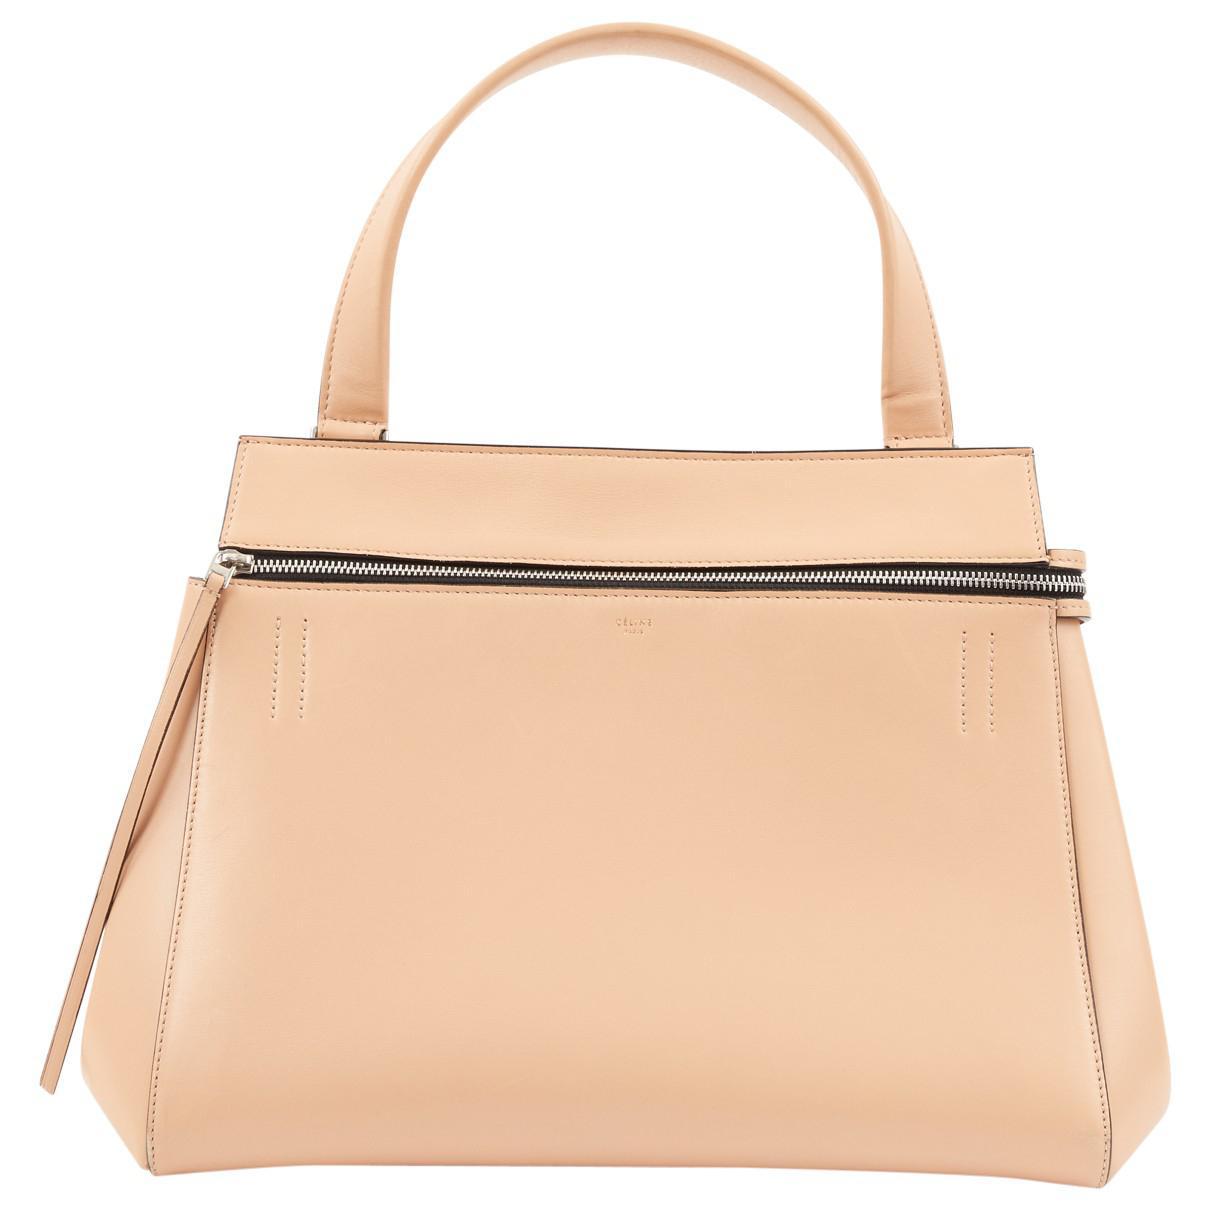 Pre-owned - Edge leather handbag Celine 7IW47KpPMN